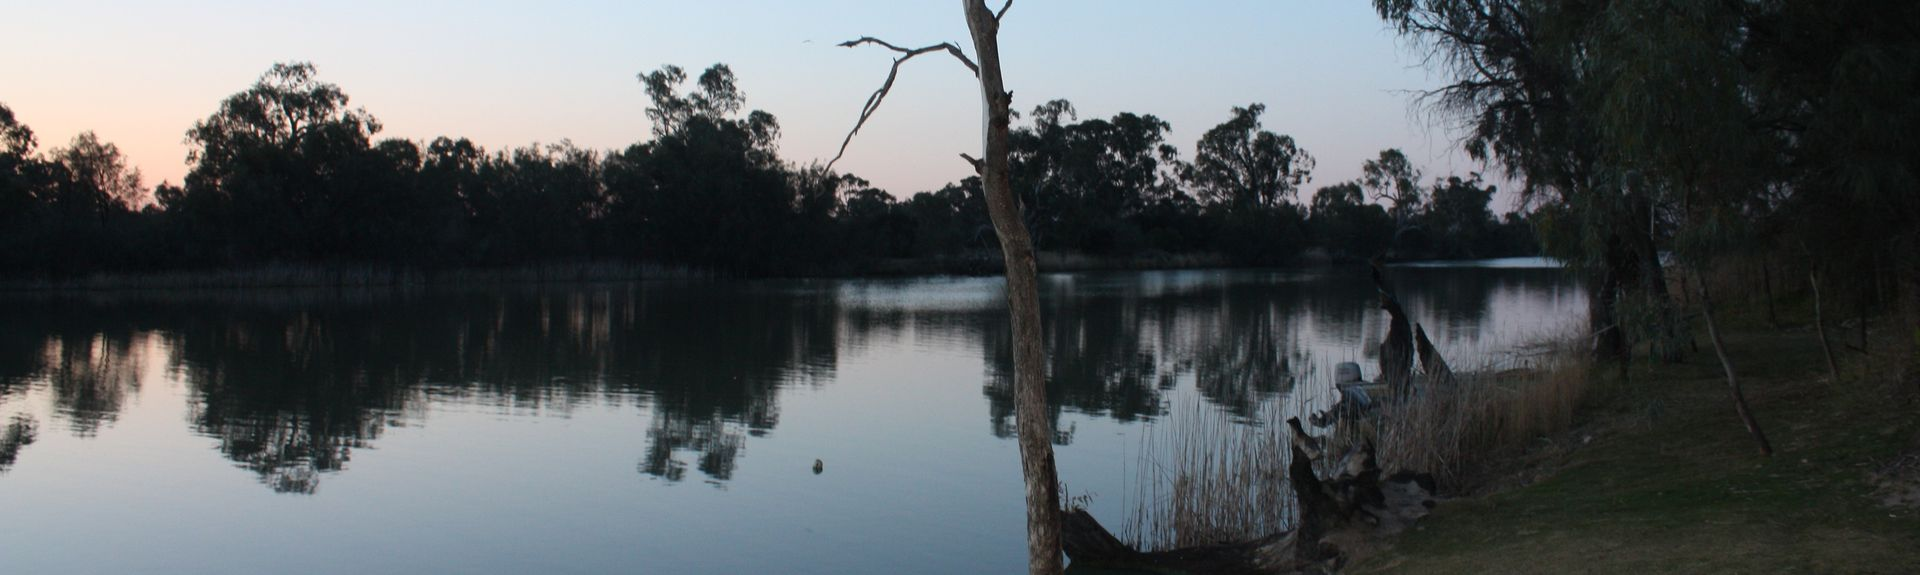 Riverland, Australia Meridional, Australia